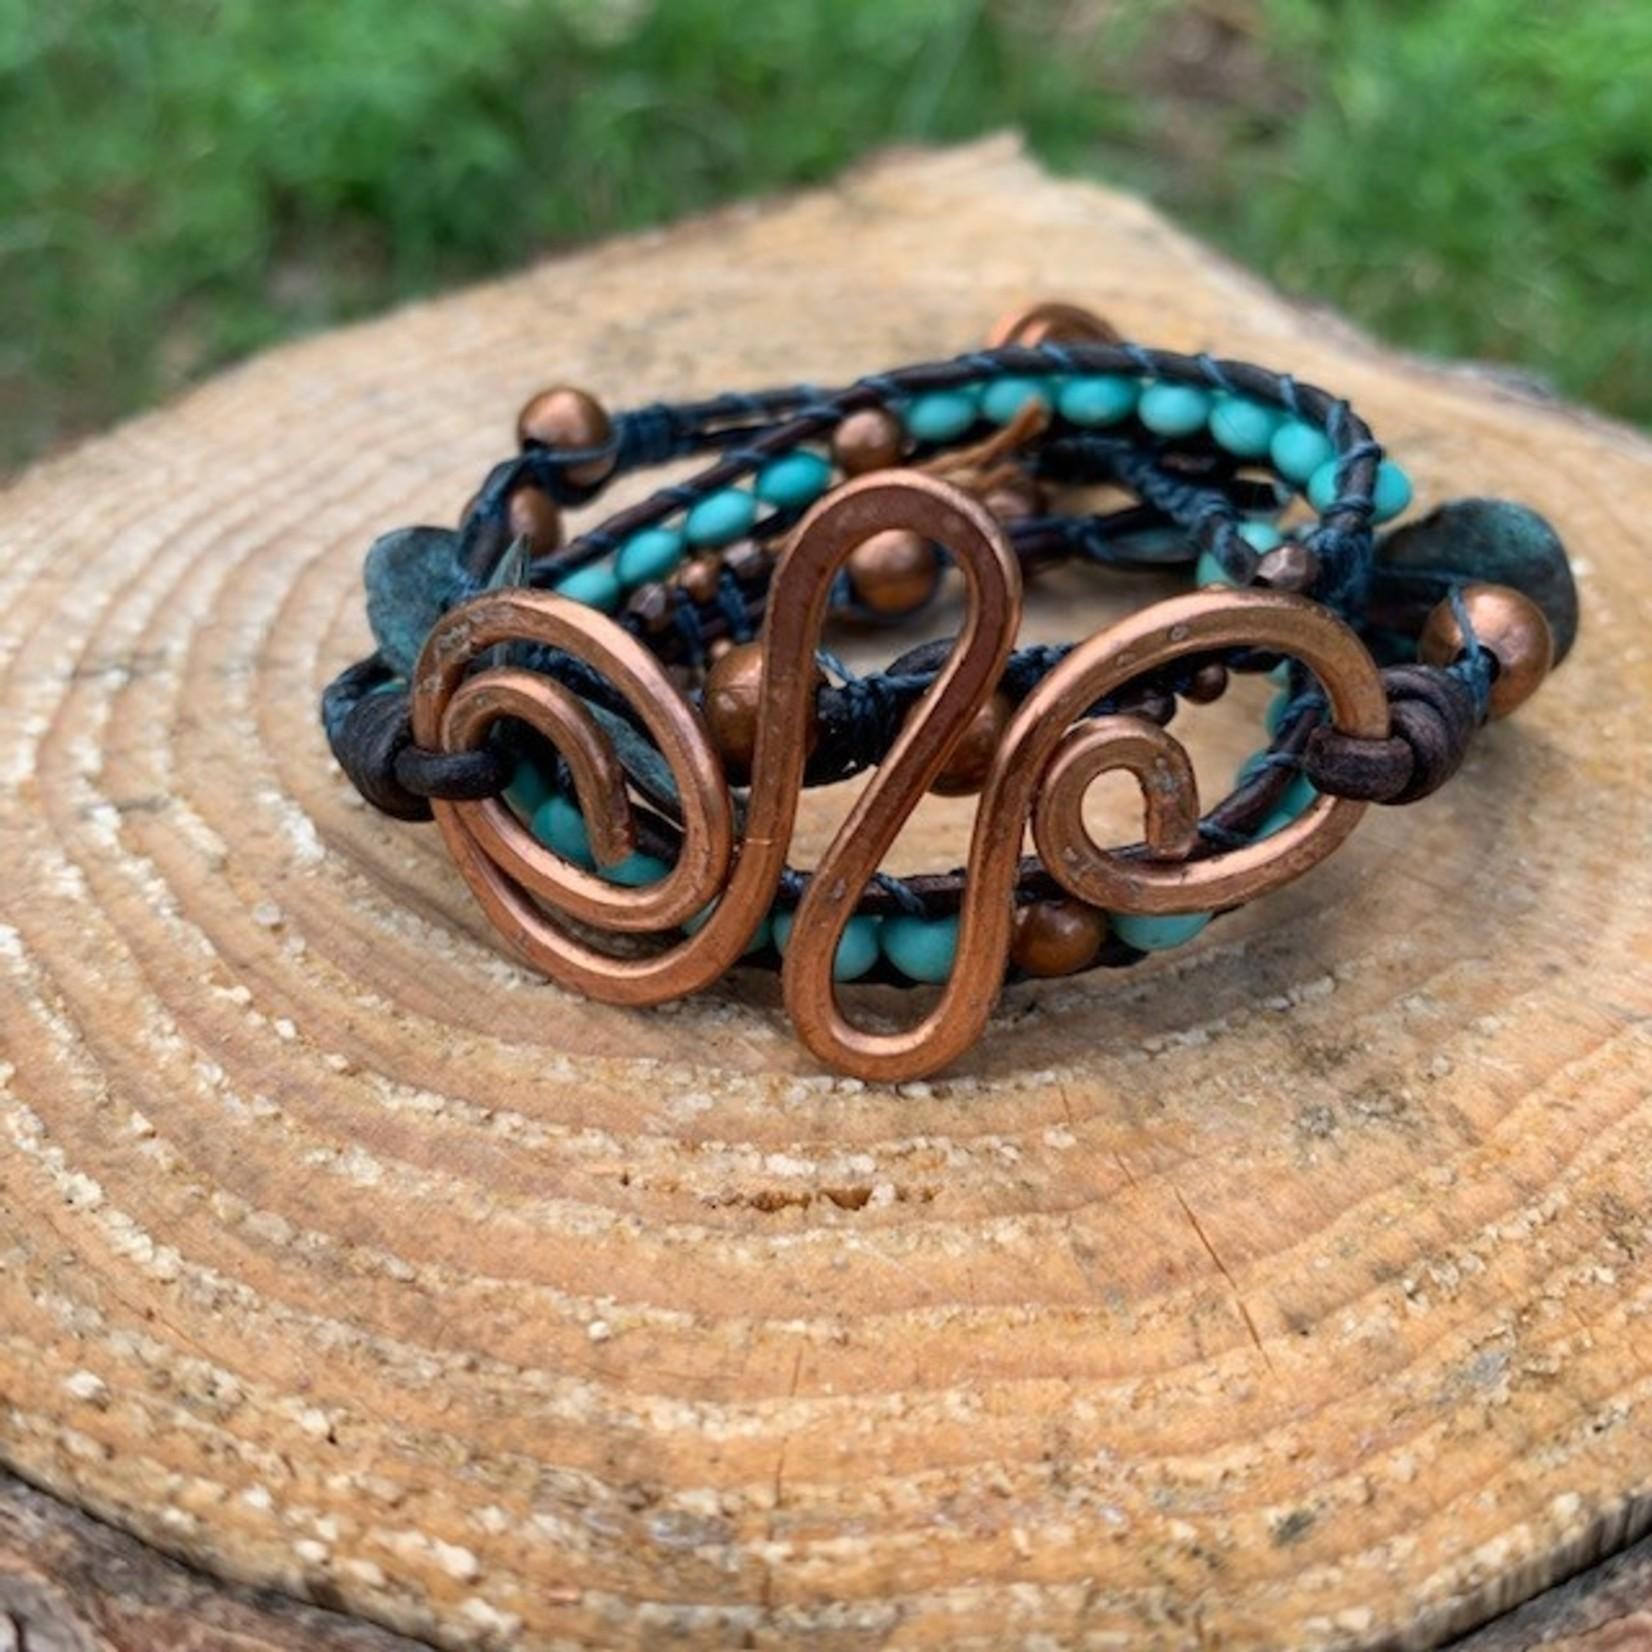 Julia Jones JMJ 720-15 3x bracelet with large swirl